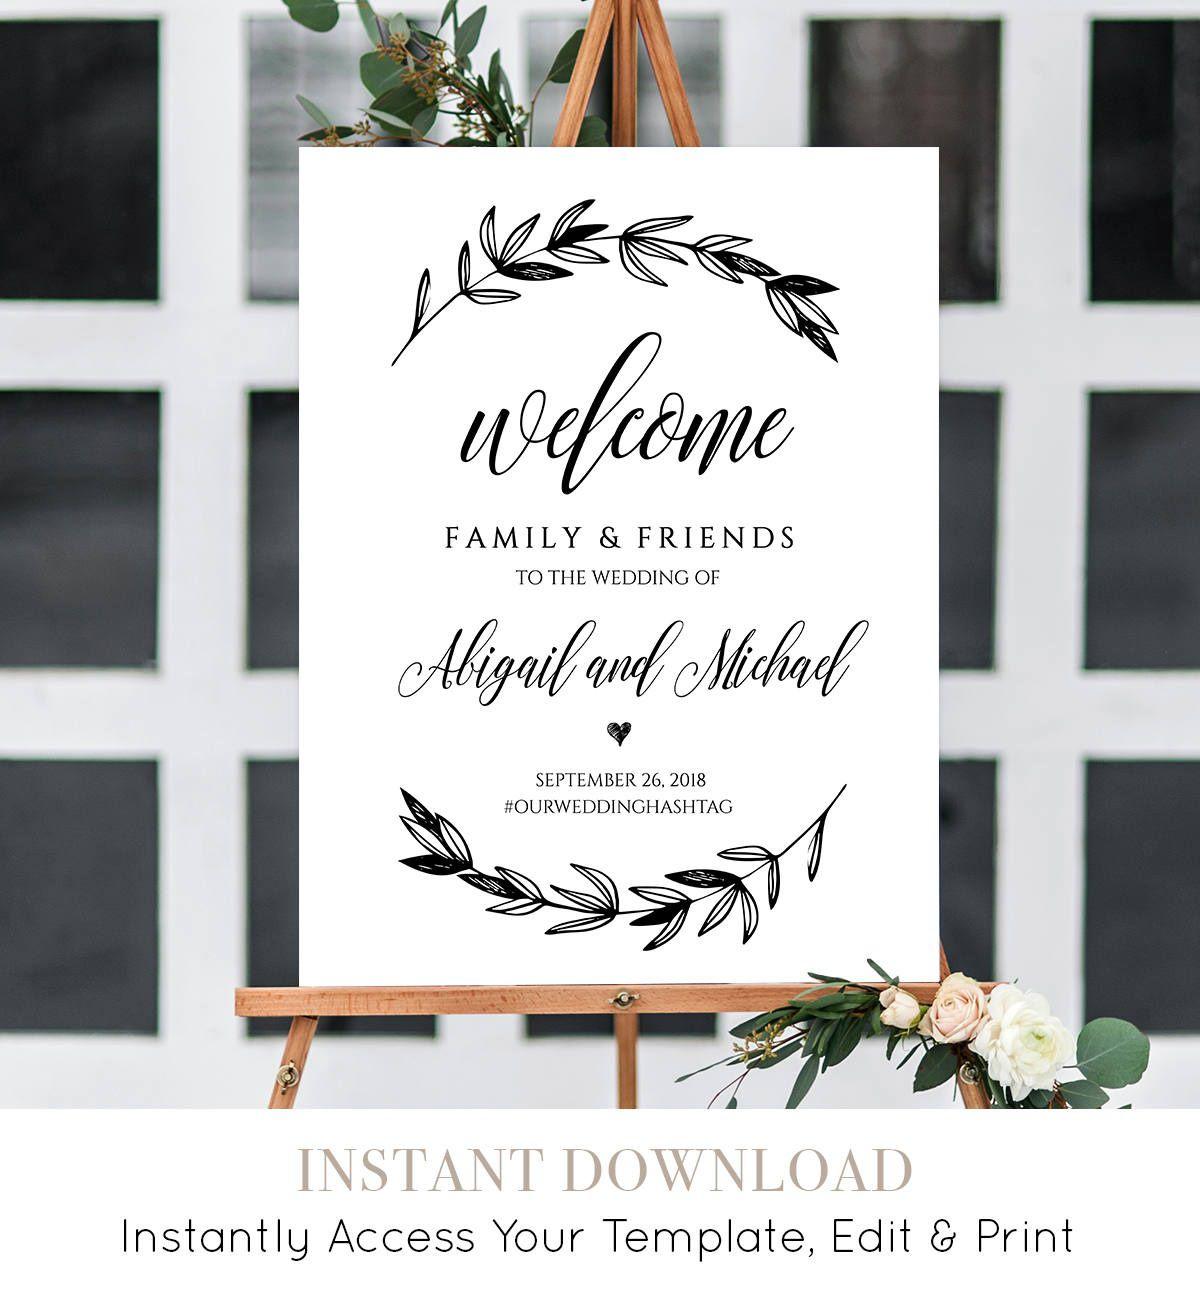 010 Striking Wedding Welcome Sign Printable Template High Def  FreeFull